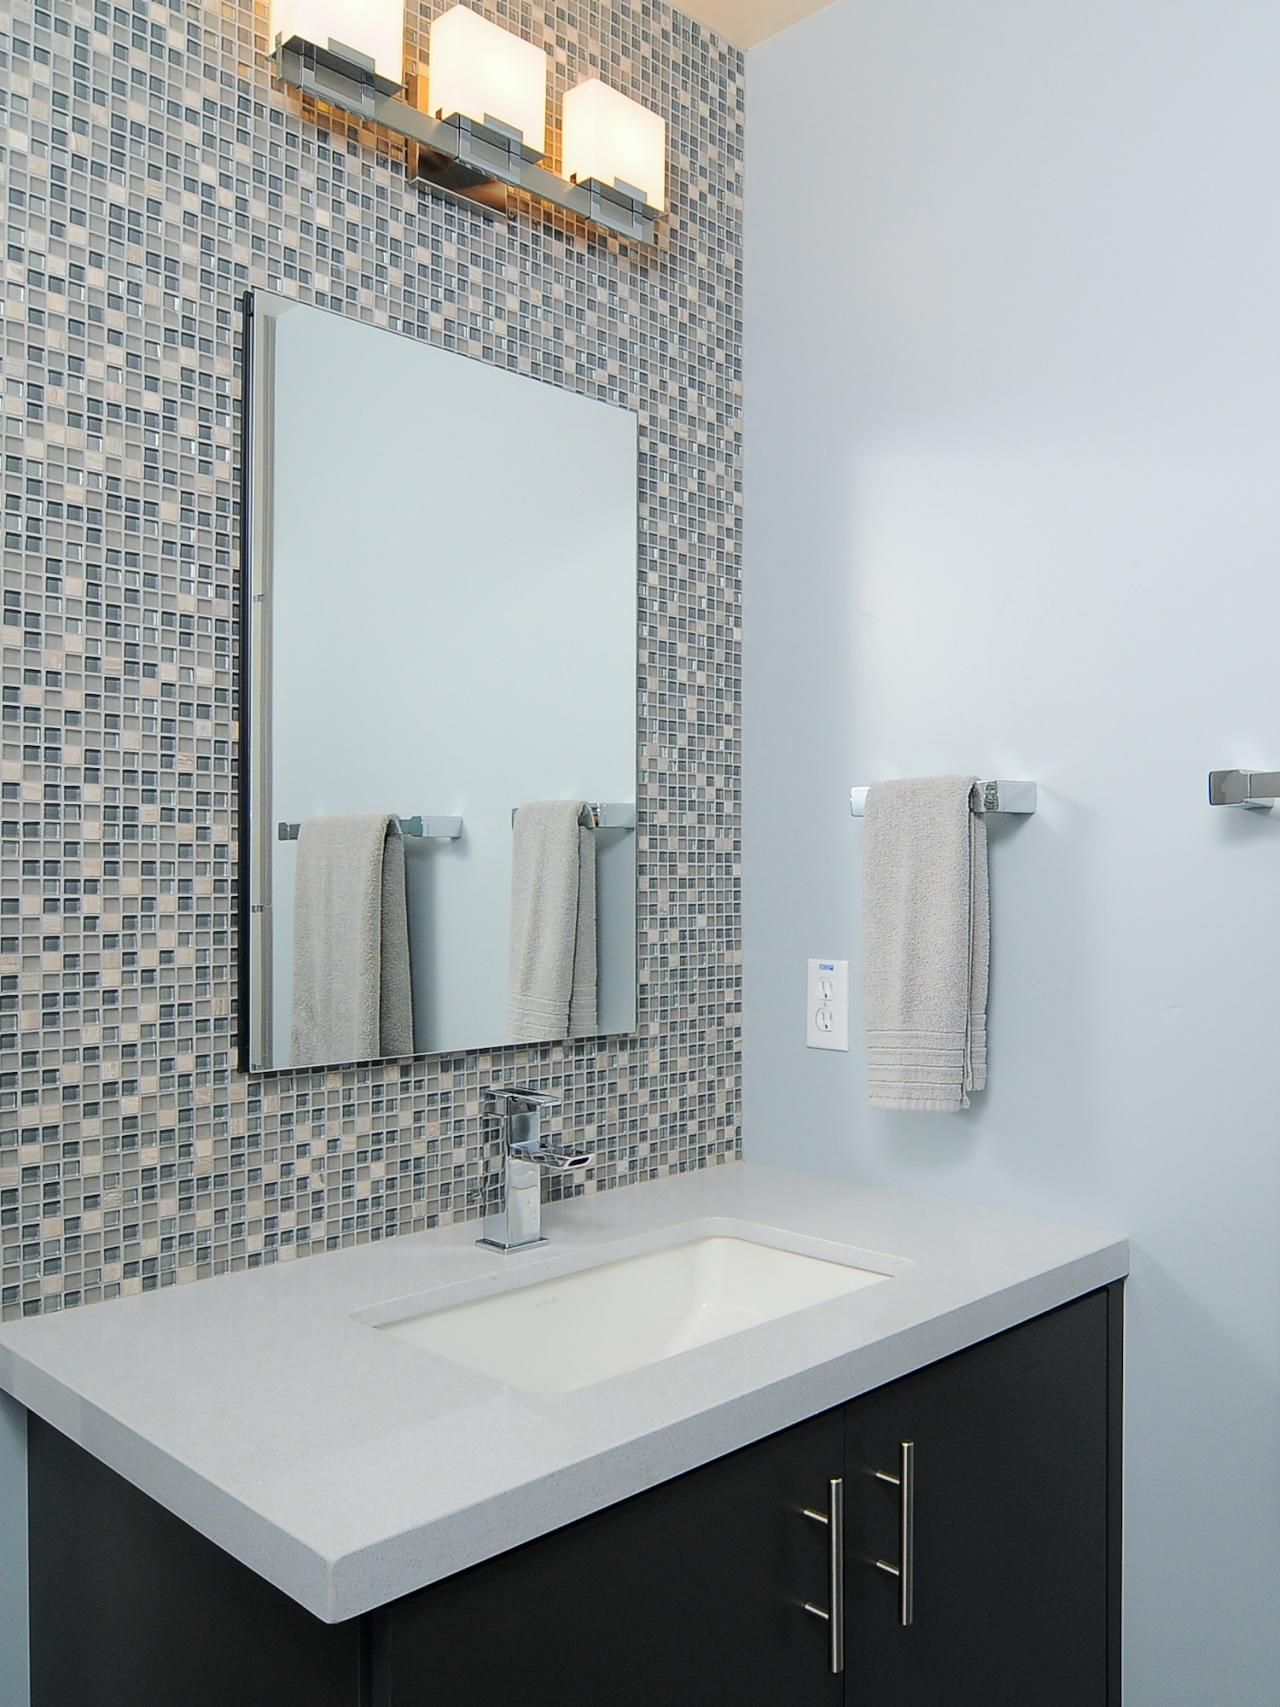 Mosaic Tile Bathroom Sink